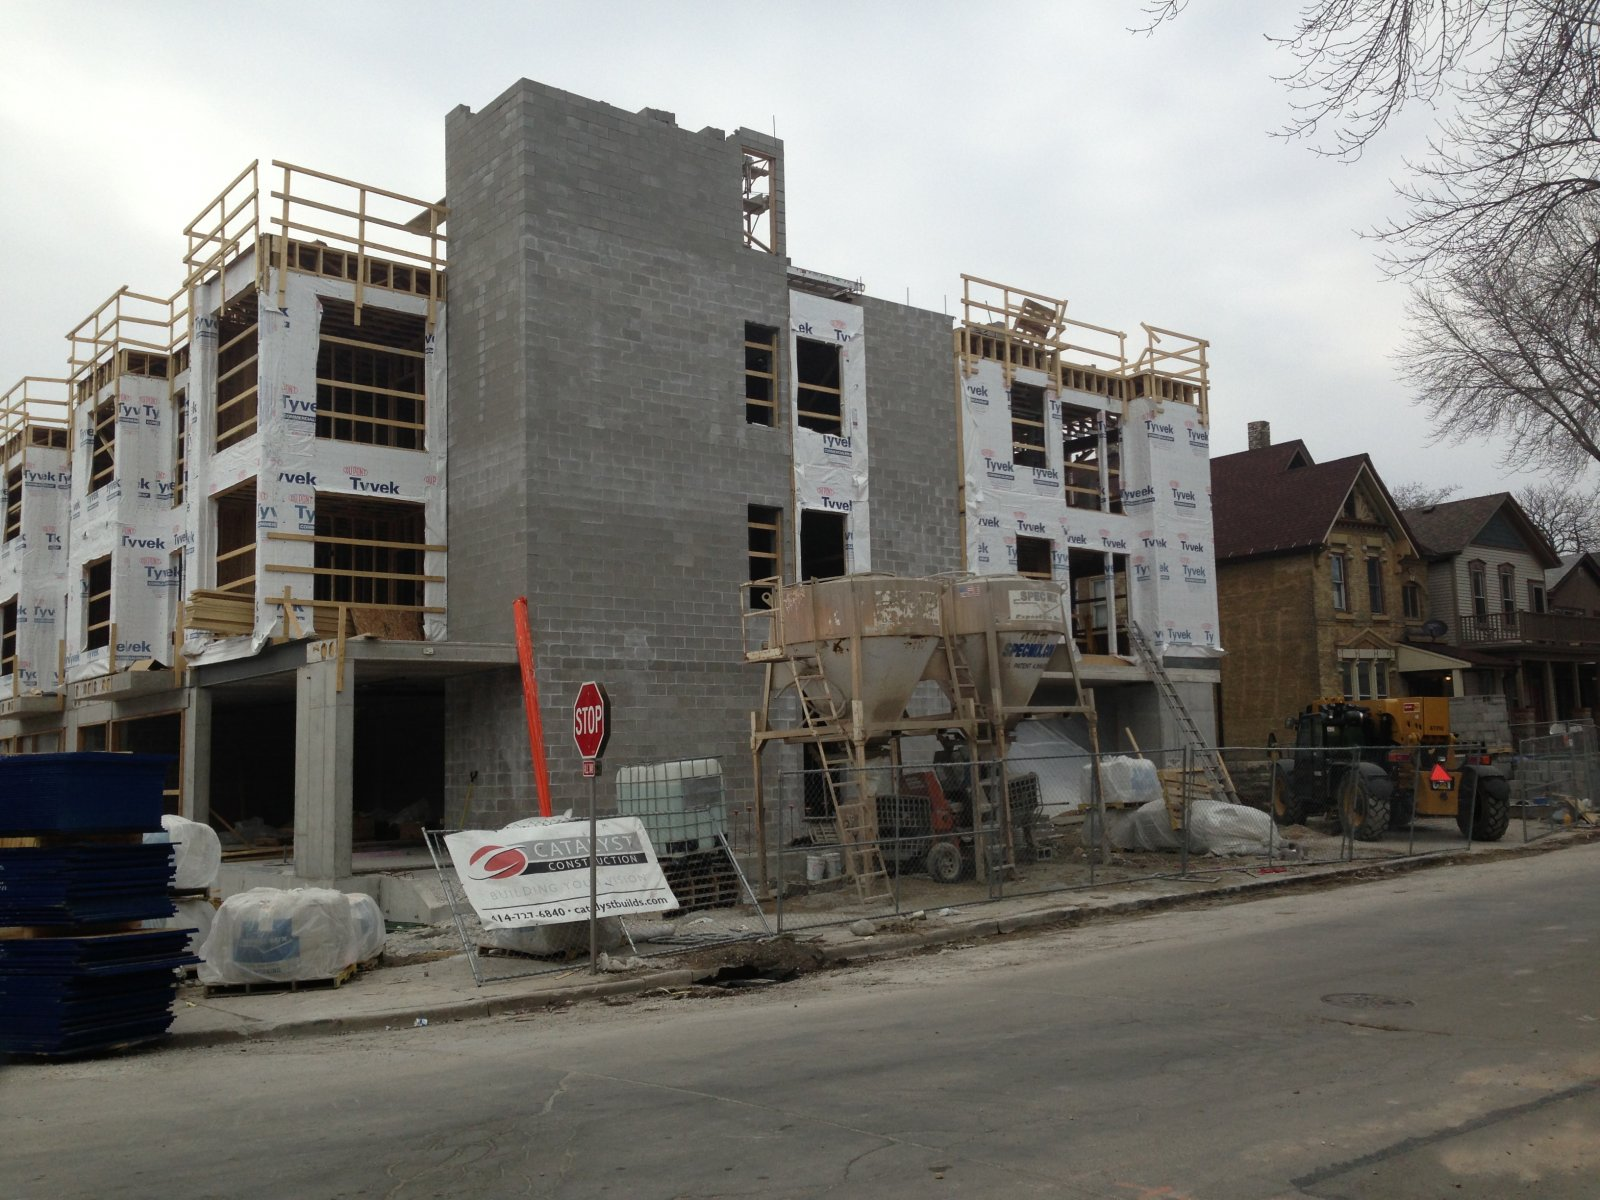 1601 N Jackson St. Under Construction.